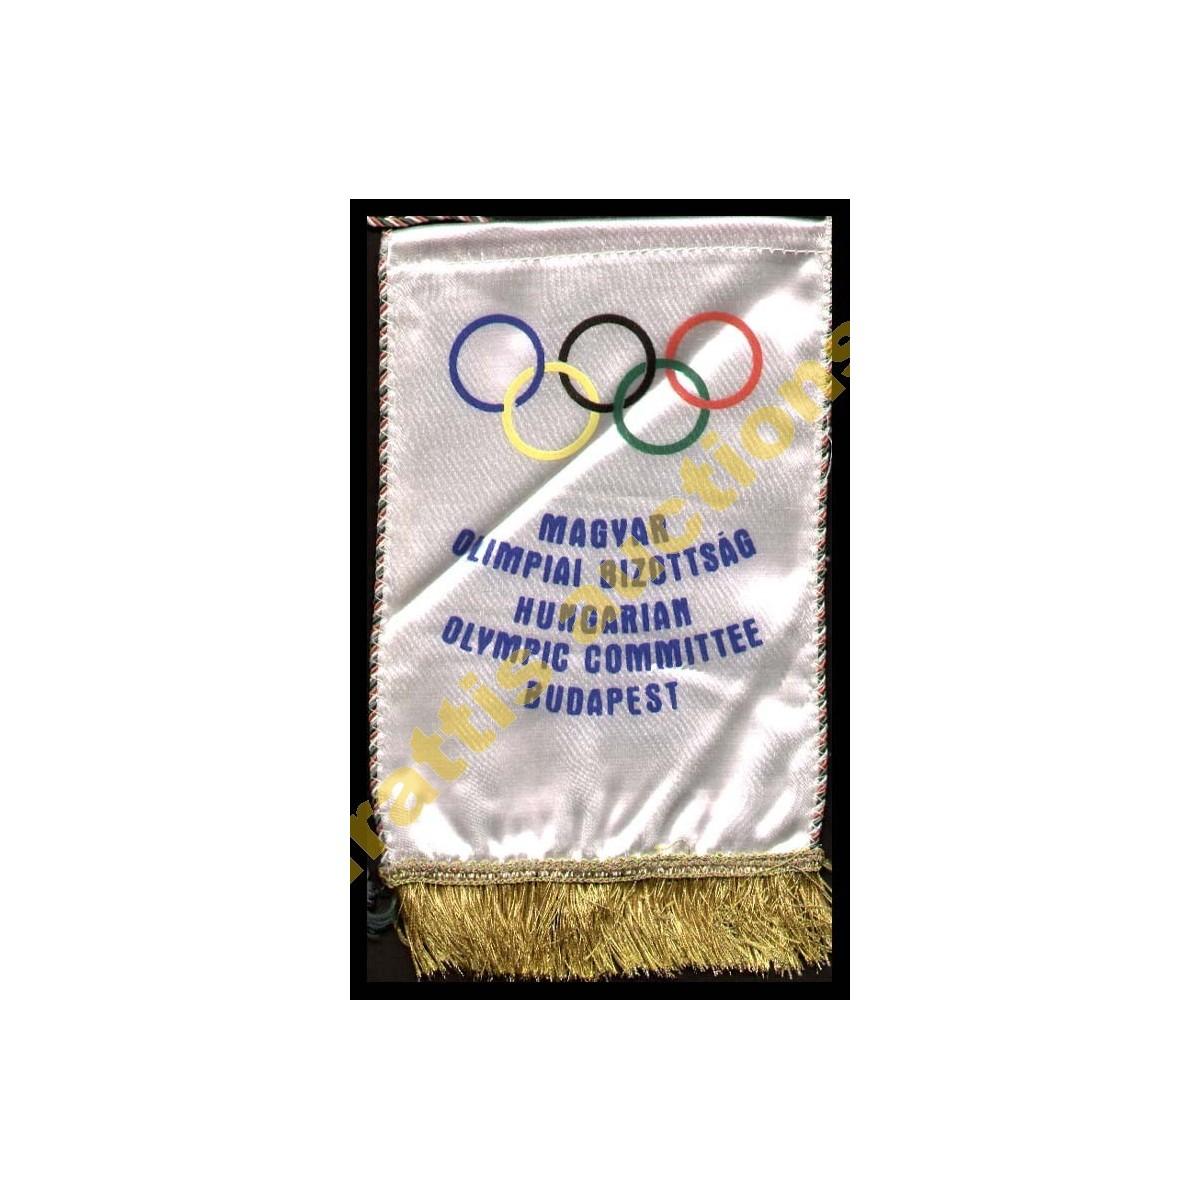 HUNGARIAN - National Olympic Committee (NOC) Baner Ολυμπιακή Επιτροπή Ουγγαρίας. Μικρό πανό Ολυμπιακή Επιτροπή της Βουδαπέστης.